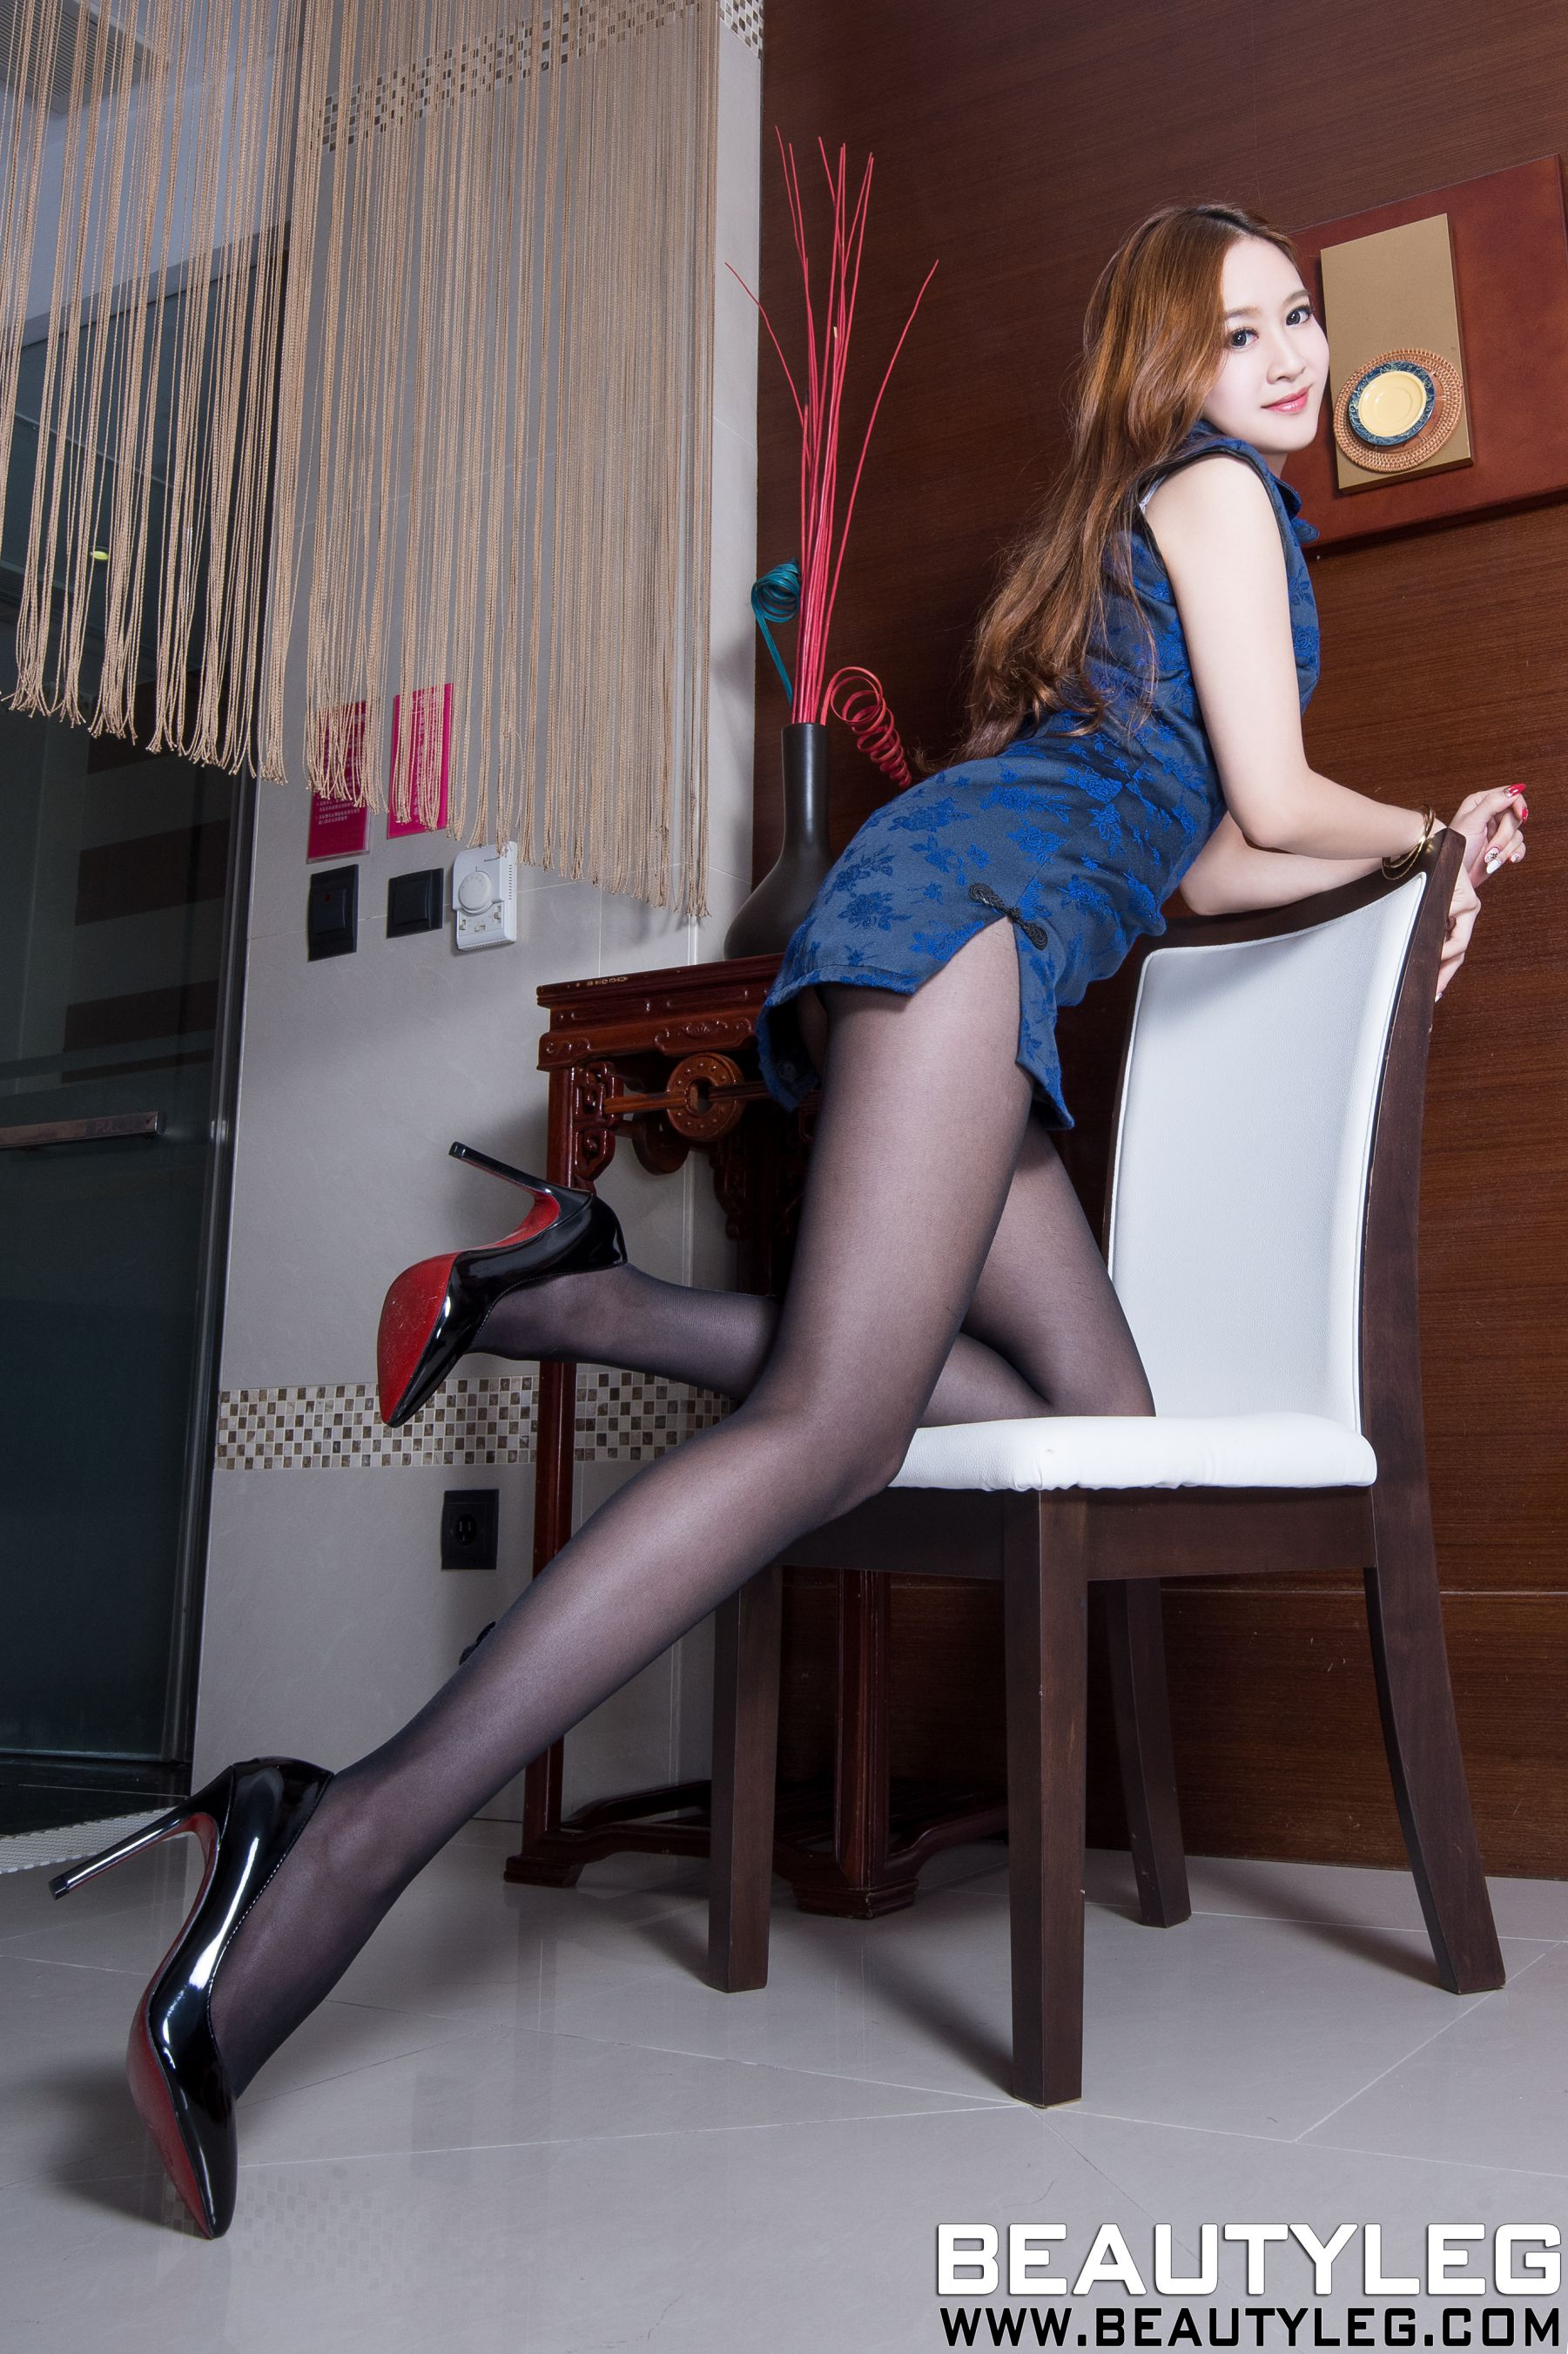 VOL.1761 [Beautyleg]吊带丝袜高跟美腿:康凯乐(腿模Kaylar)高品质写真套图(45P)